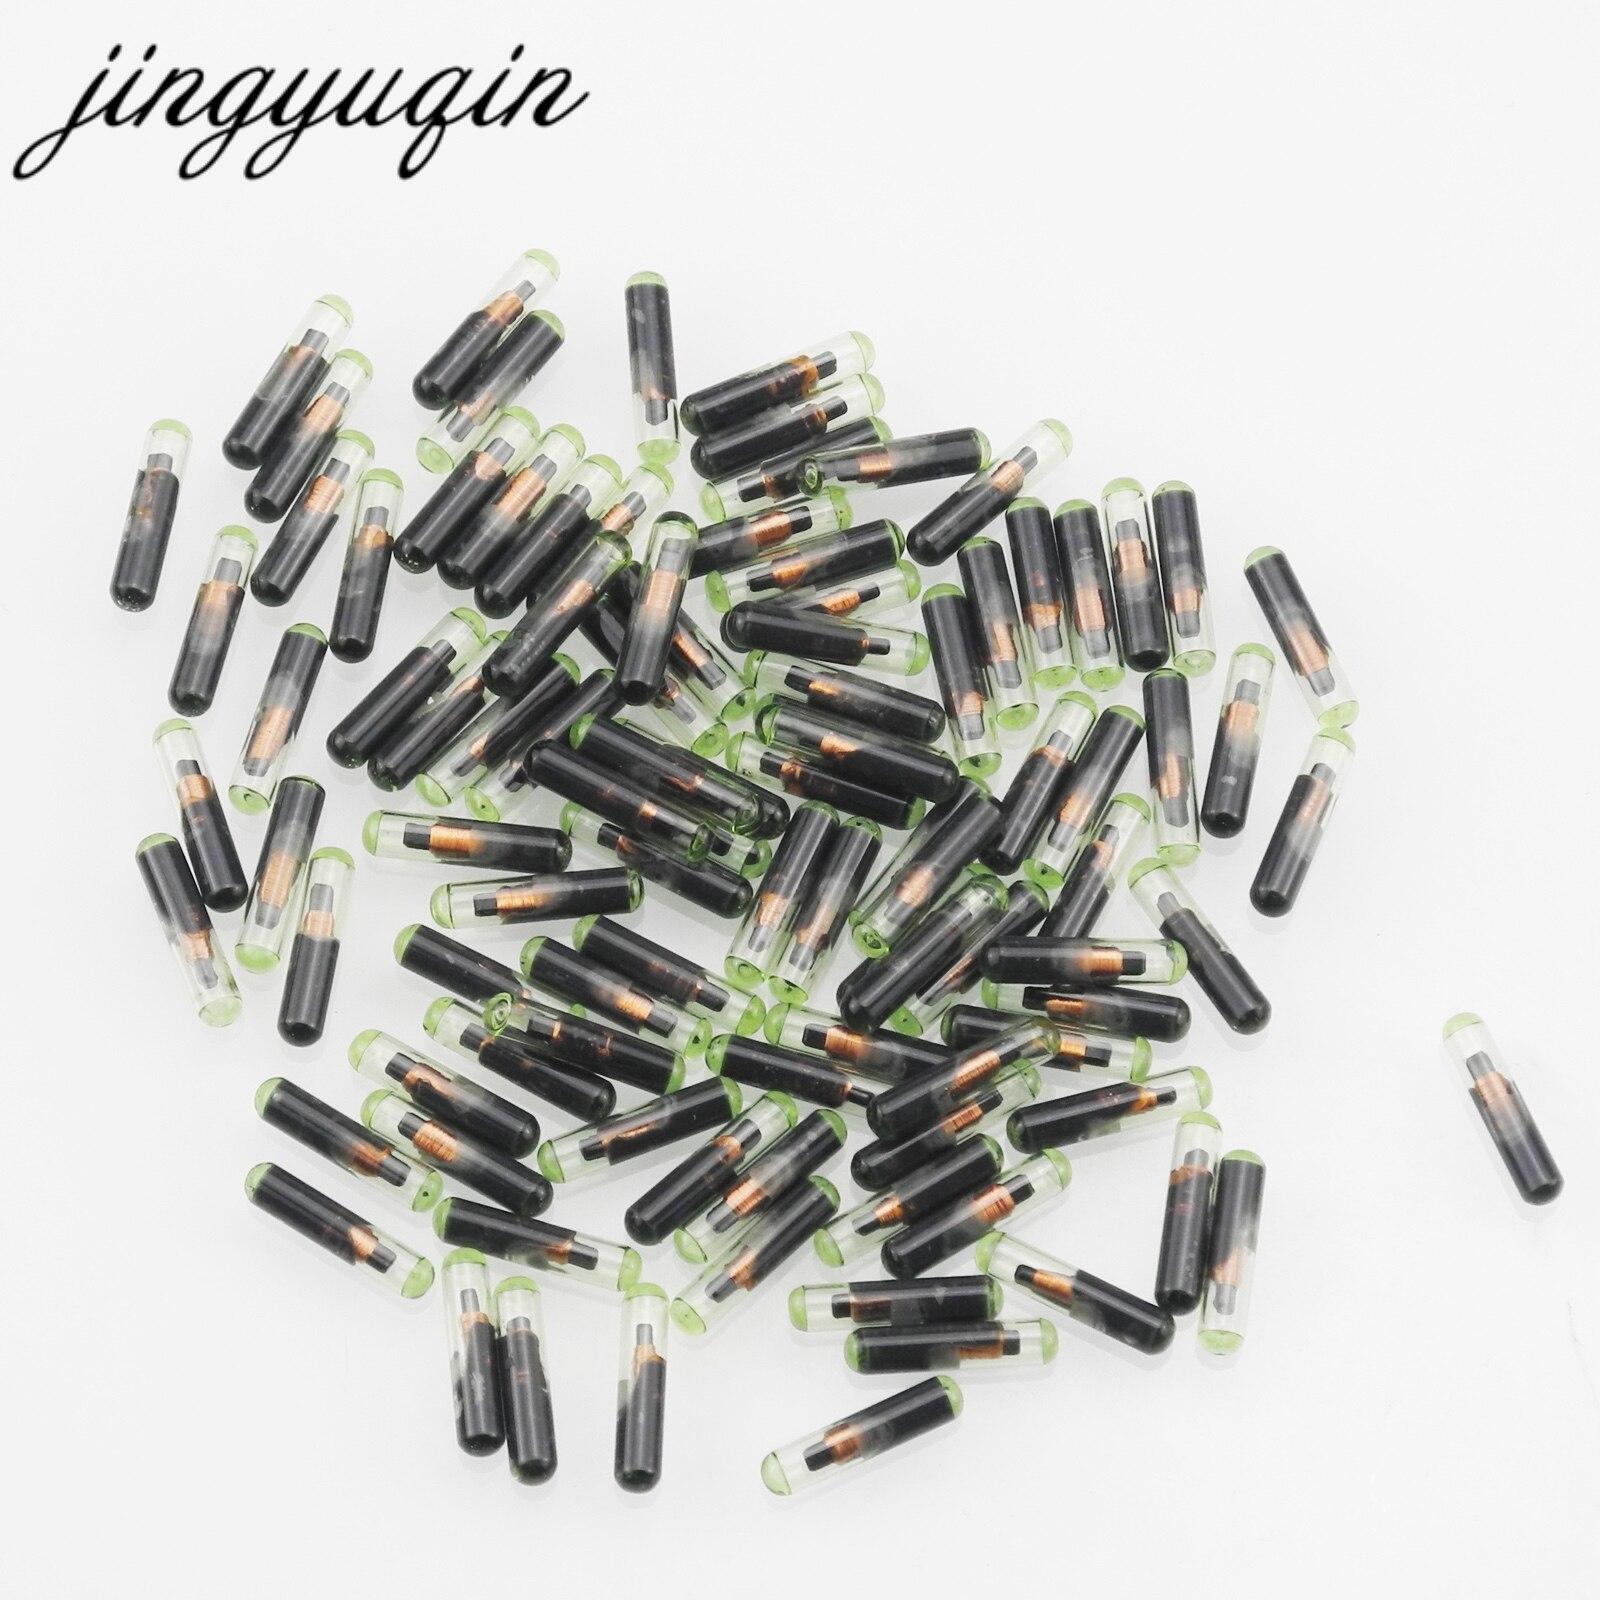 Jingyuqin-10 unids/lote de llave de coche, transpondedor ID48 T6, Chip Crypto desbloqueado para VW /Audi /Seat /Skoda /Porsche